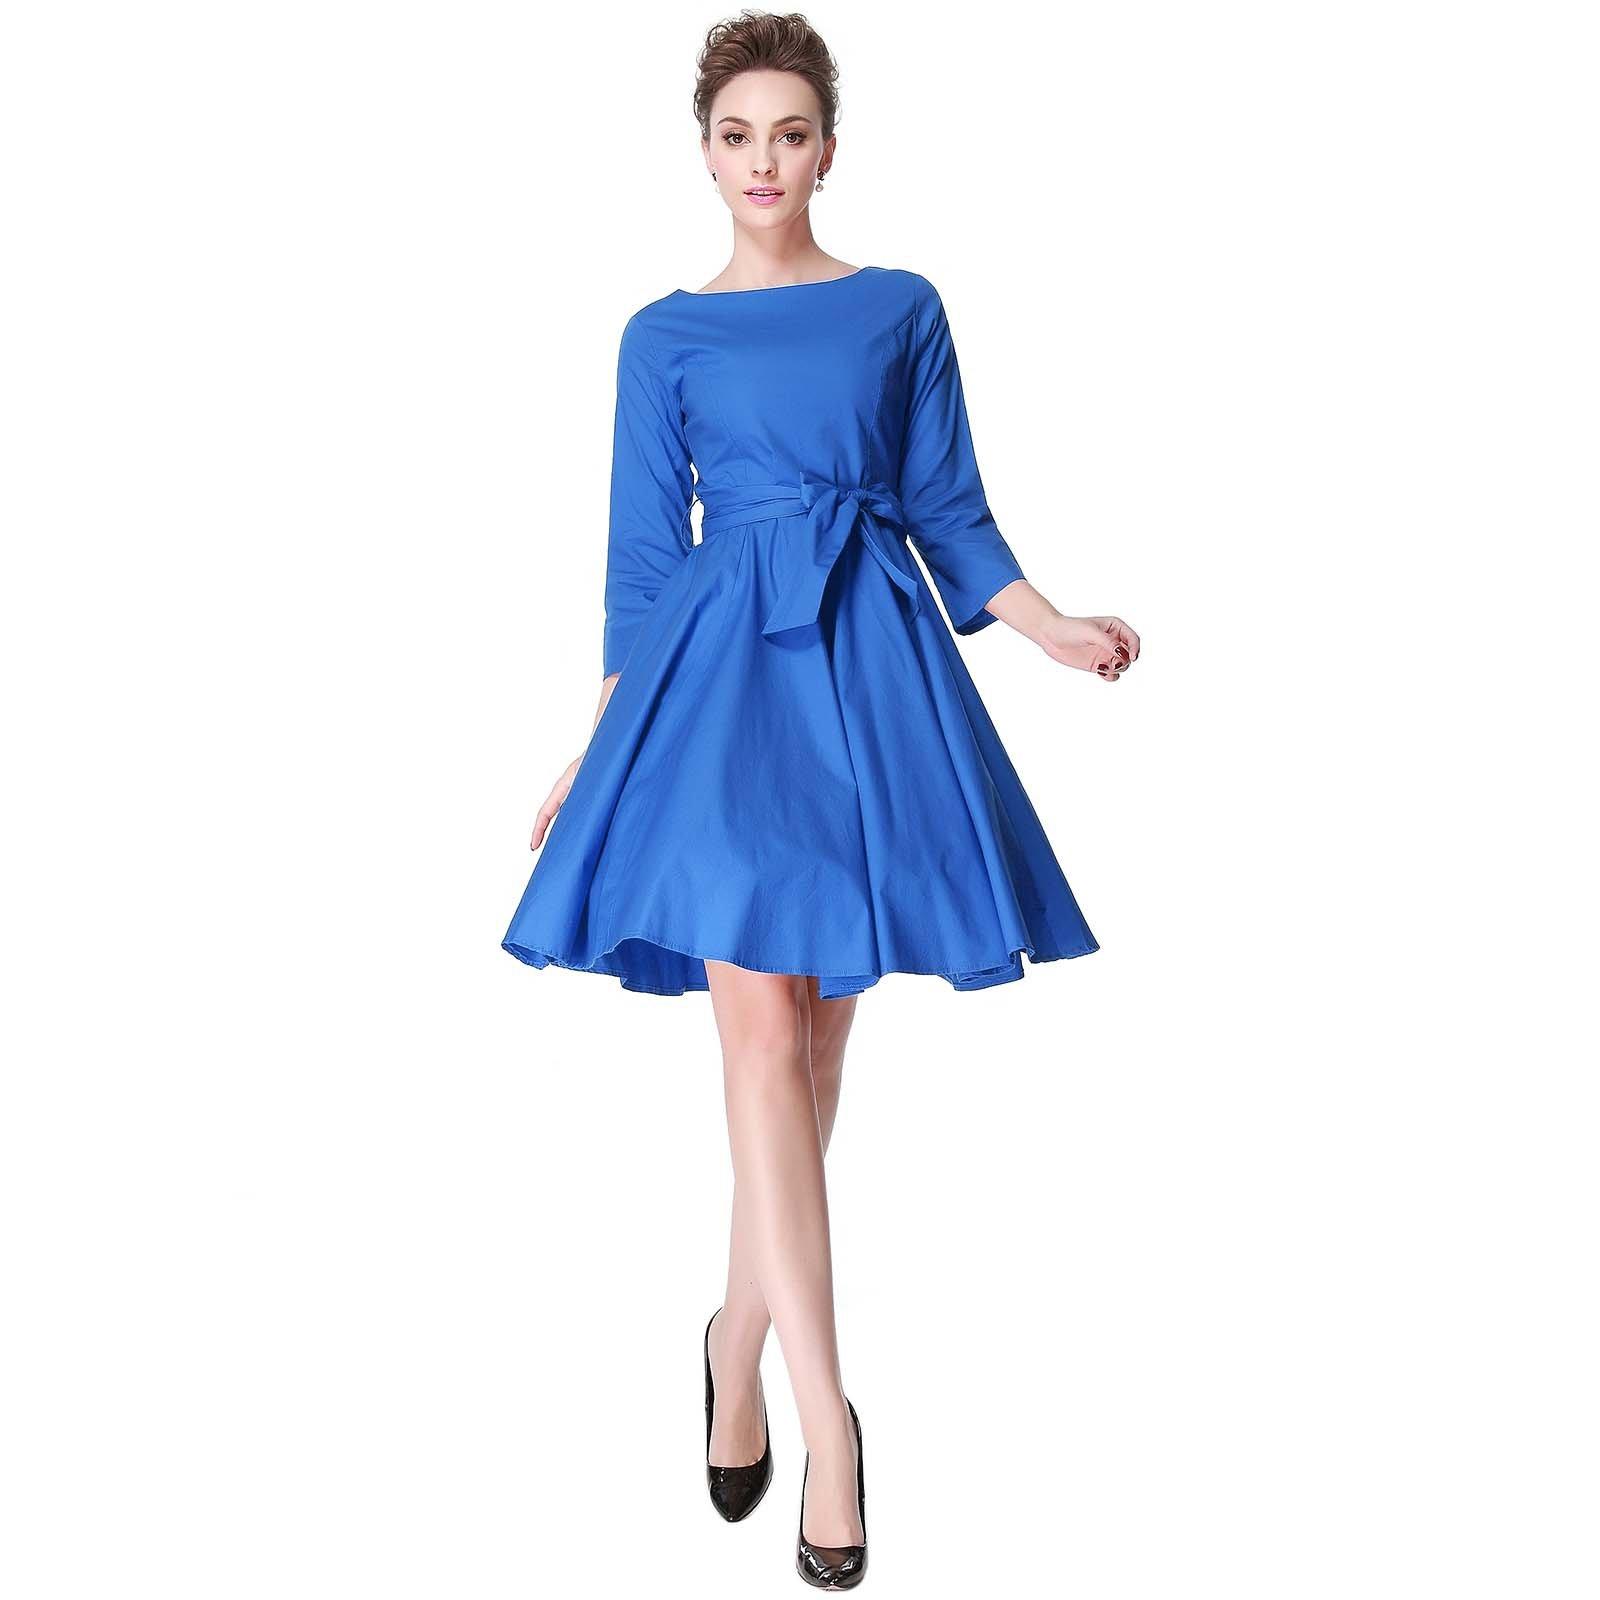 Heroecol 50s 60s Hepburn 3/4 Sleeve Style Vintage Retro Swing Rockailly Dresses Size L Color Blue